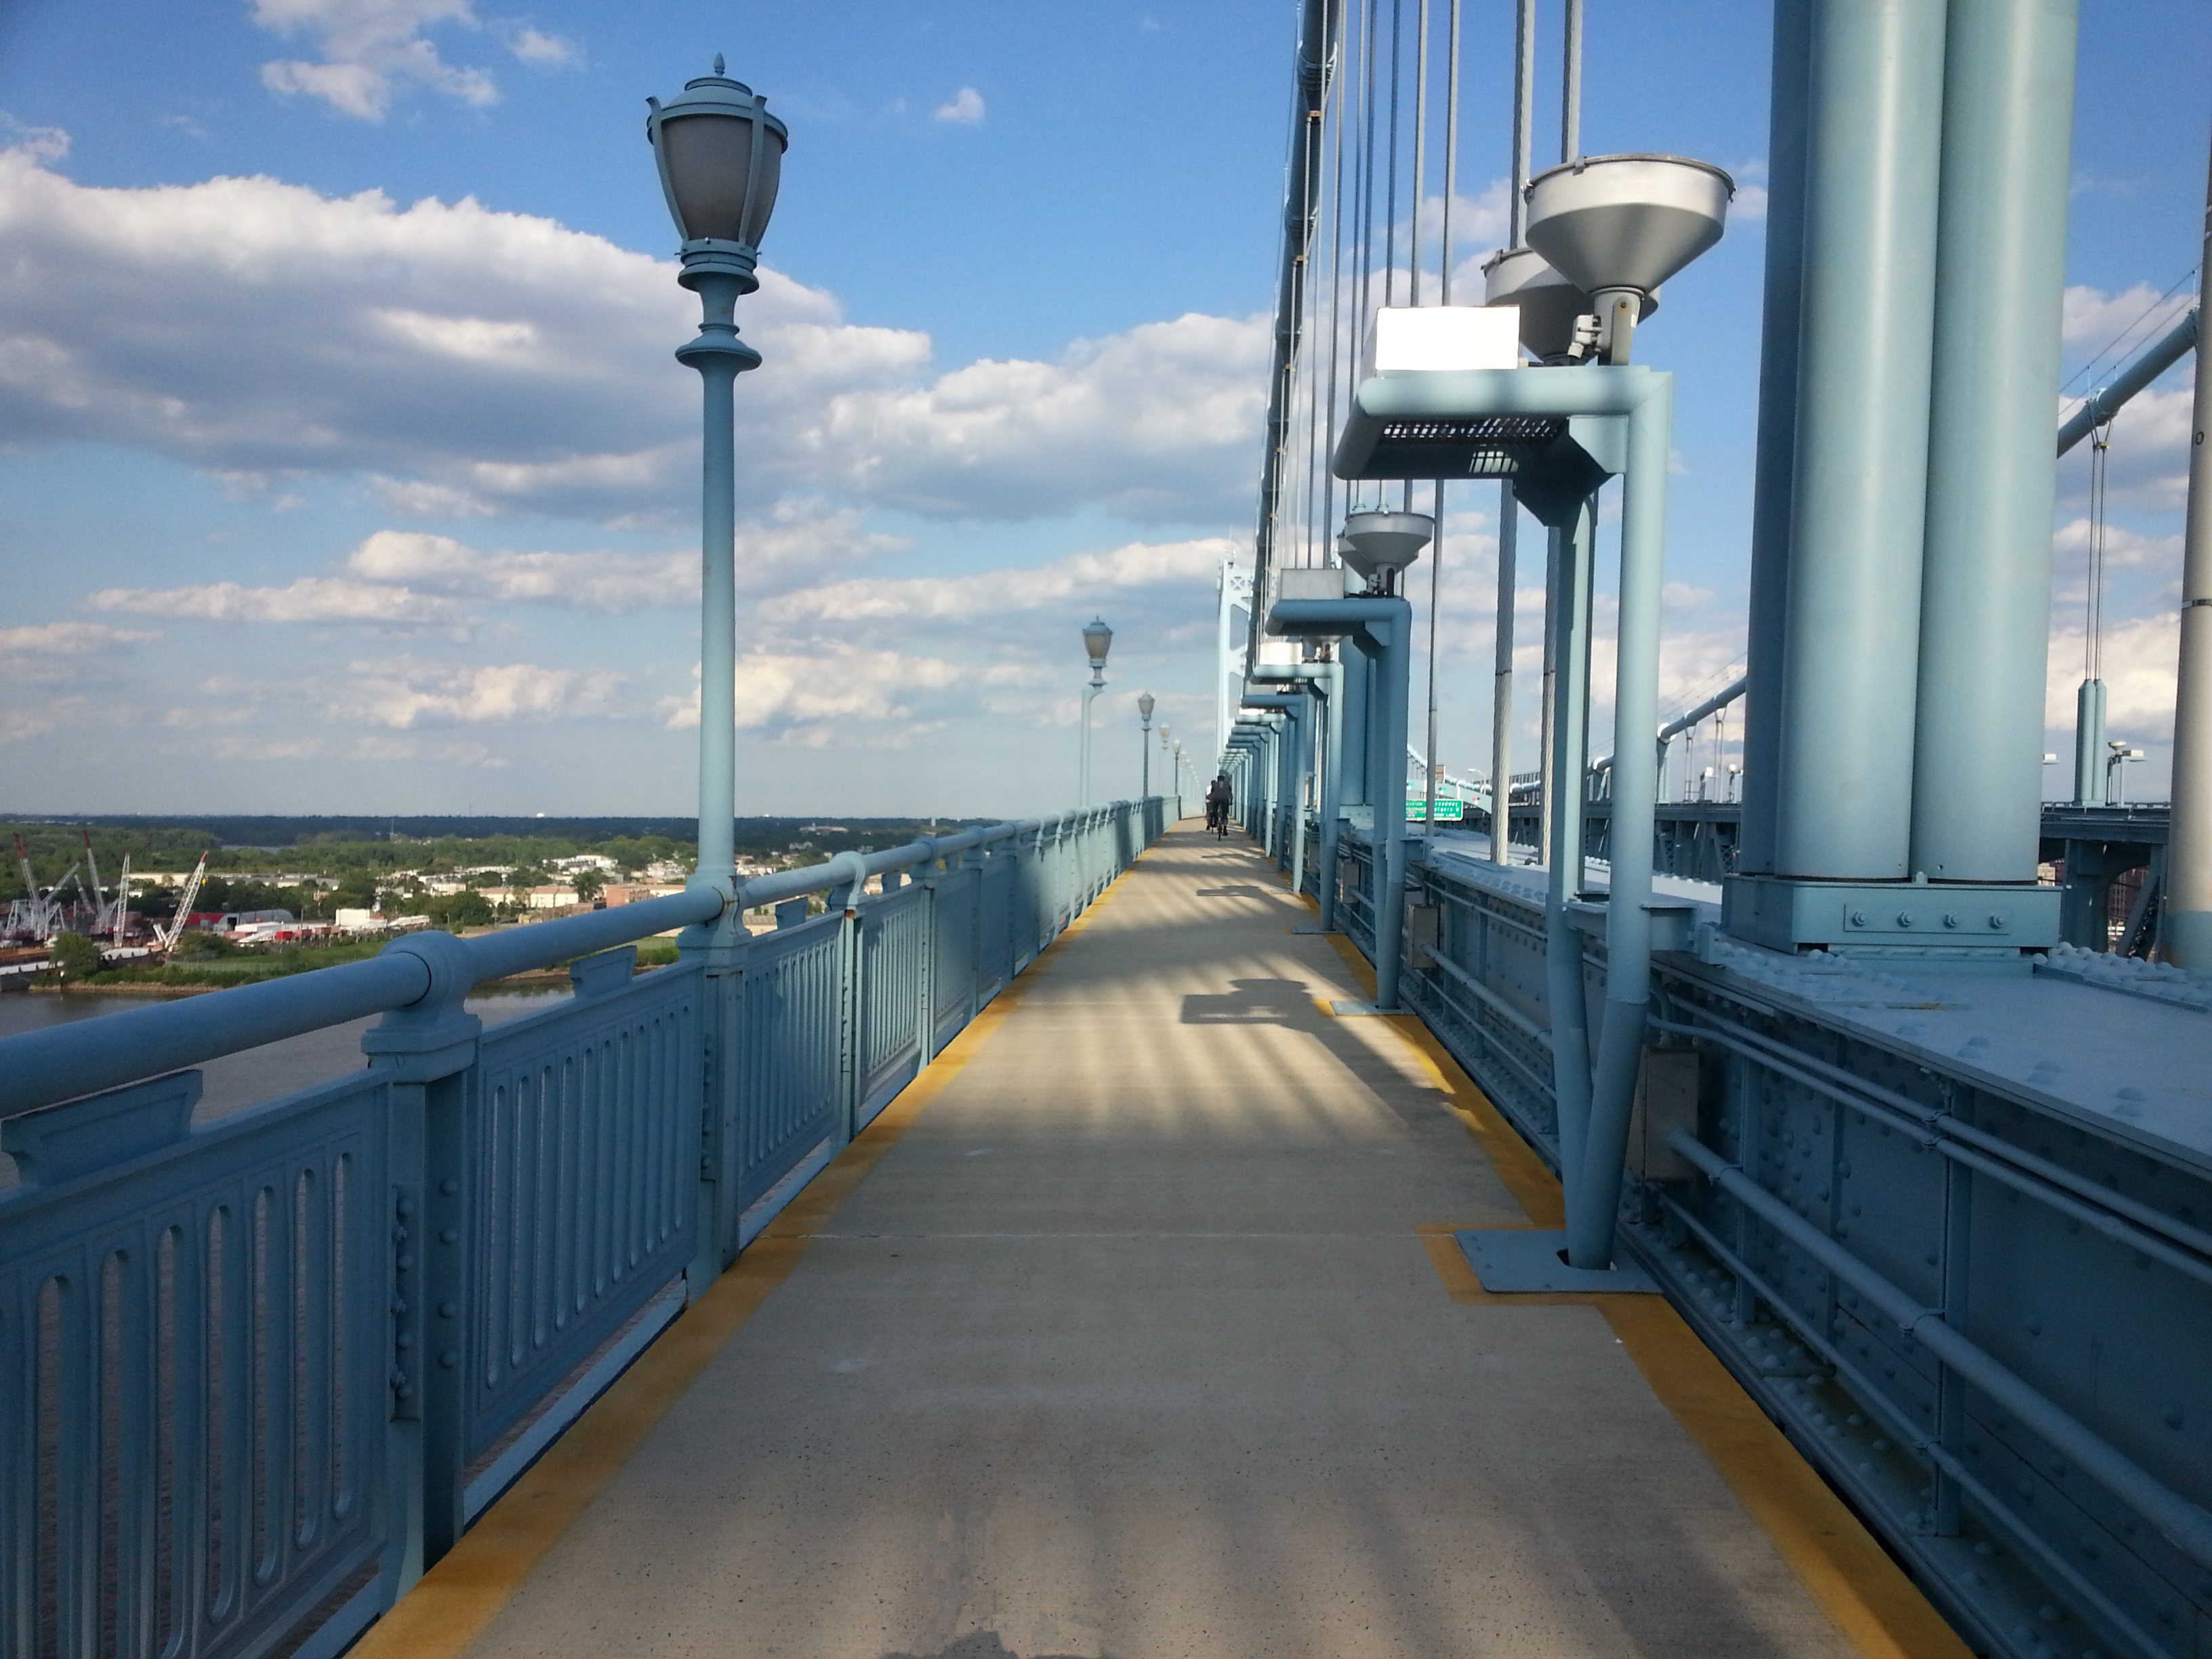 Looking east on the north walkway of the Ben Franklin Bridge.